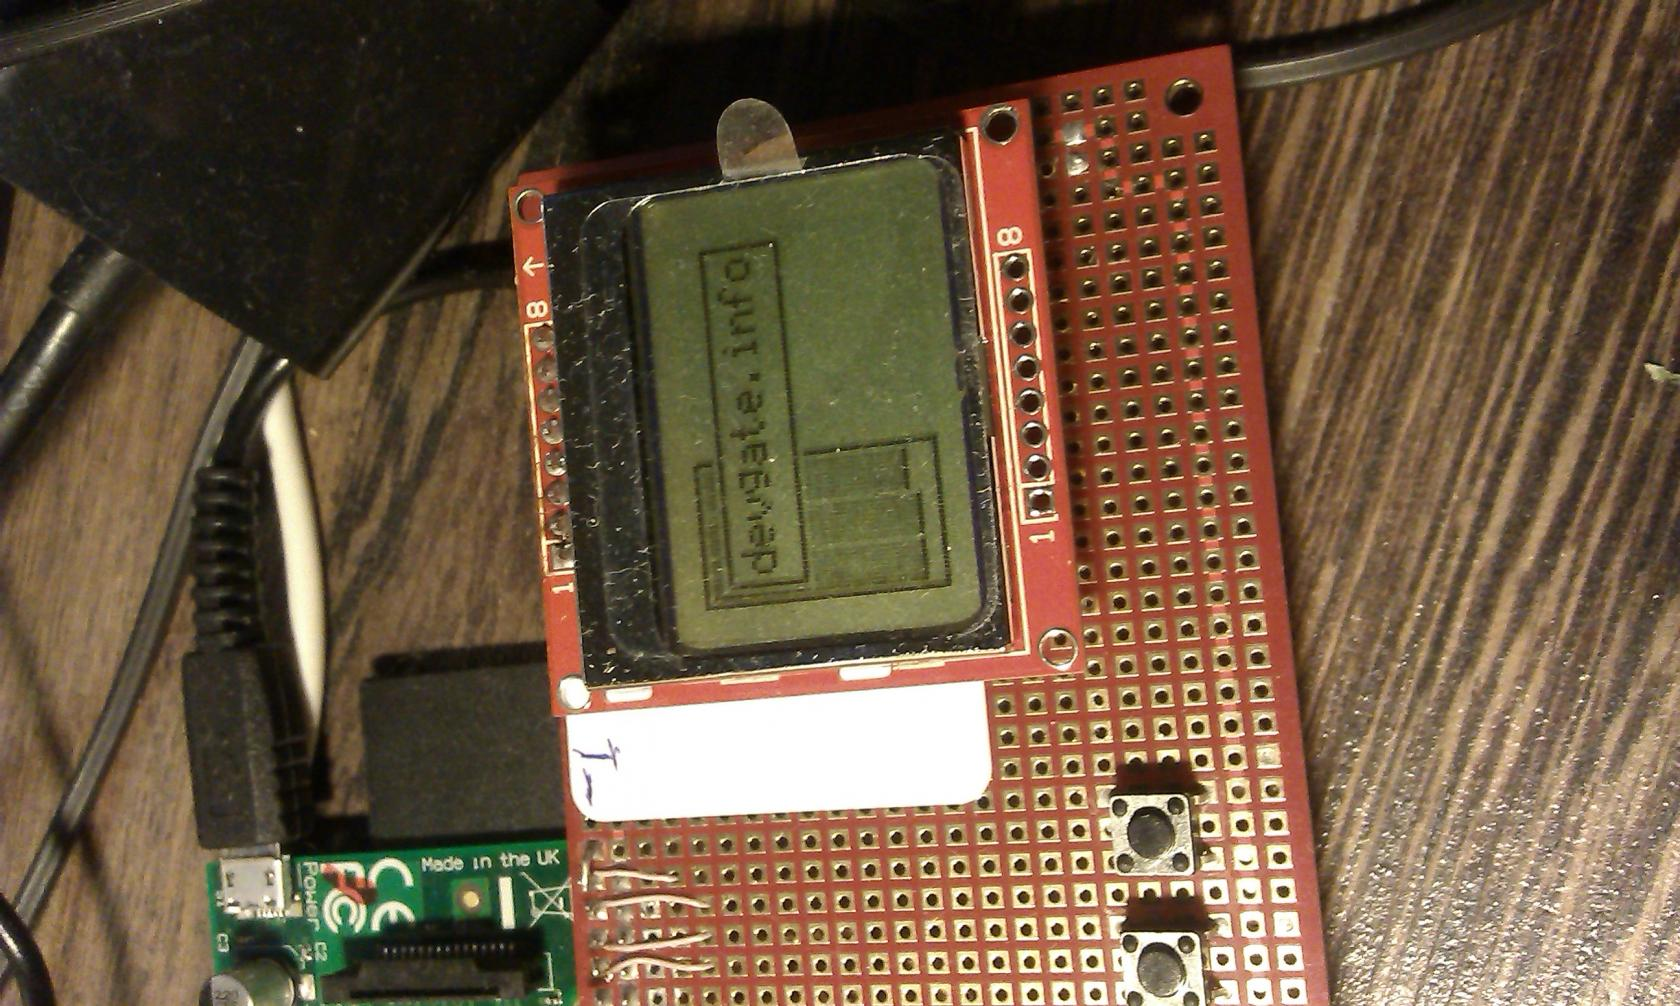 Wiringpi Spi Lcd Not Lossing Wiring Diagram Raspberry Pi Gpio U041f U0440 U043e U0435 U043a U0442 U044b U0424 U0443 U043c Arduino Ua C Example Adafruit Backpack